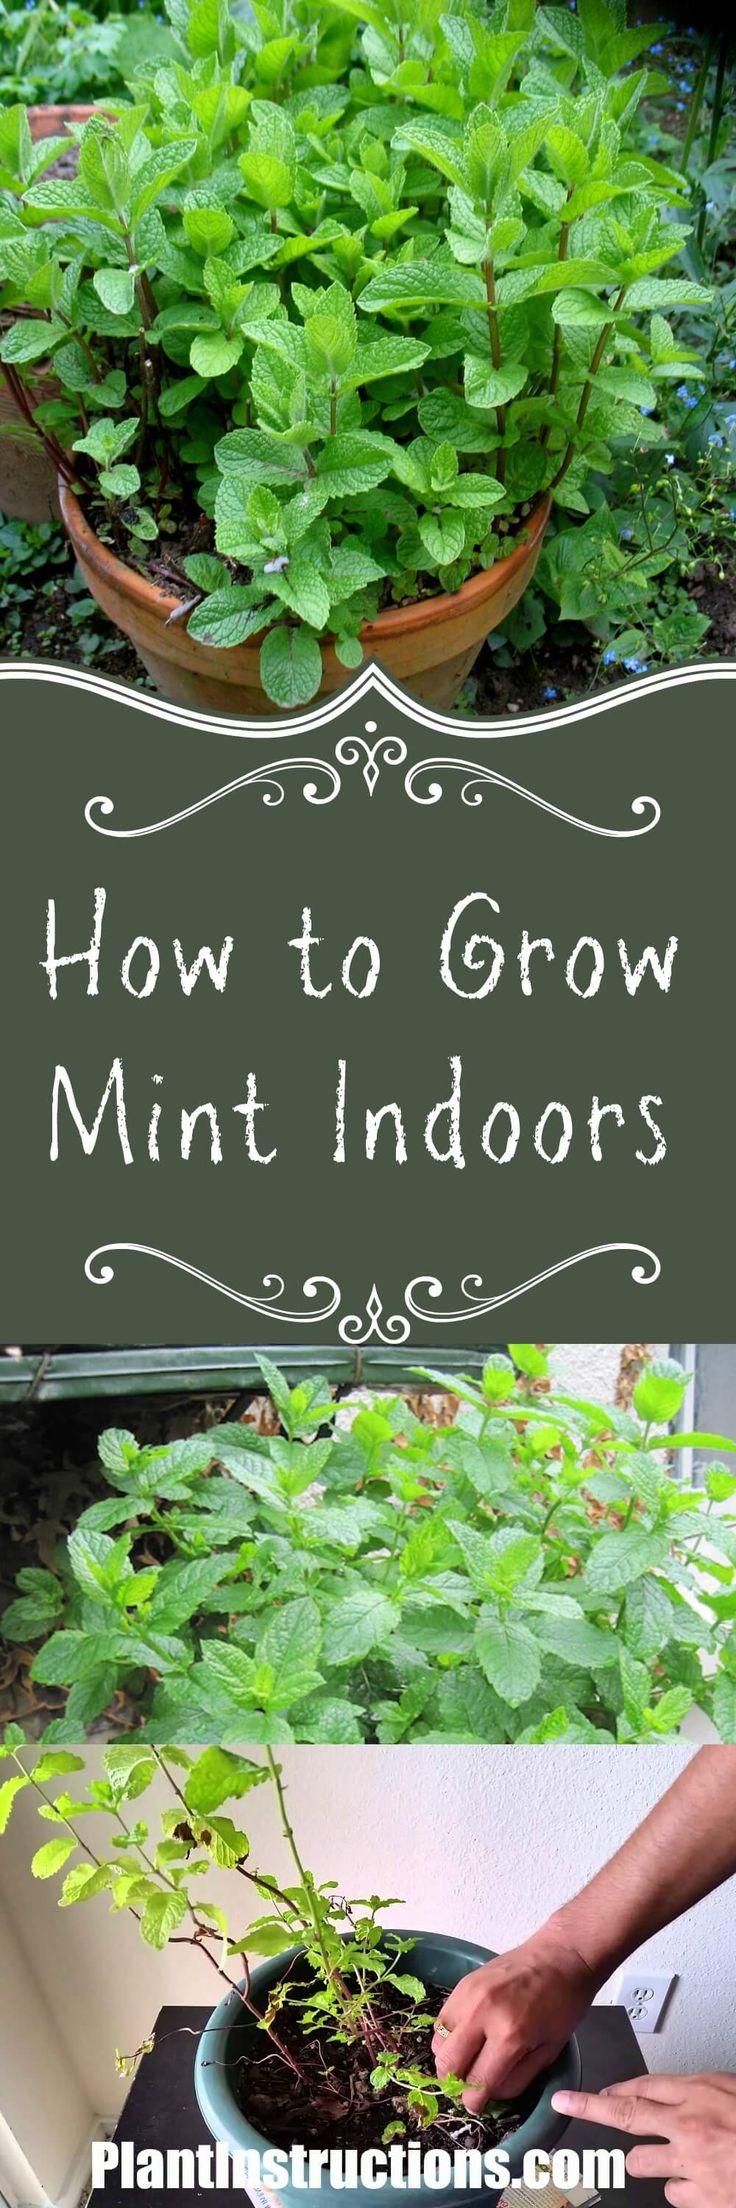 best 25 growing mint ideas on pinterest grow mint indoors mint garden and herb pots. Black Bedroom Furniture Sets. Home Design Ideas